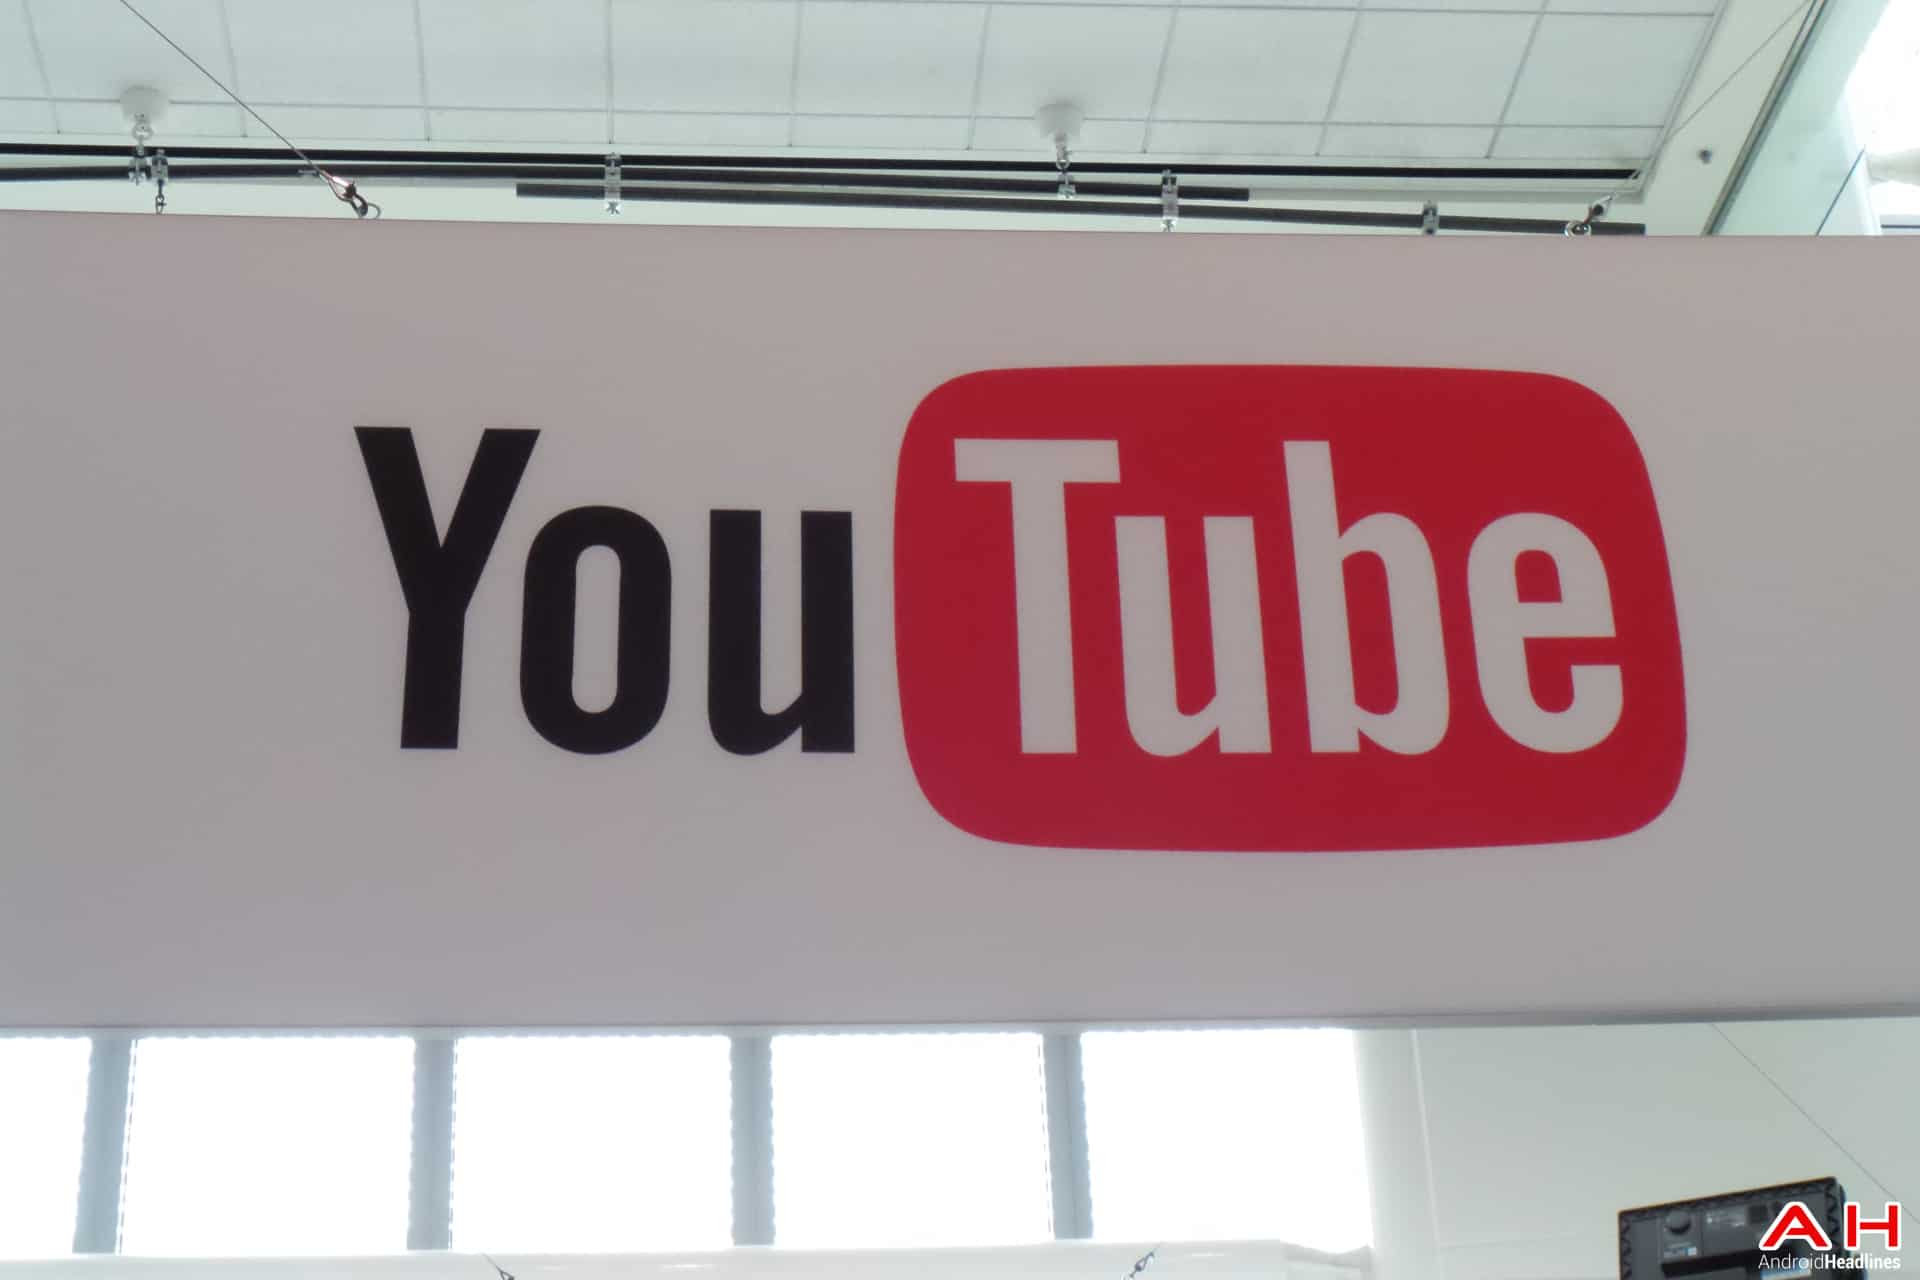 AH Google IO 1427 Youtube logo and isgn